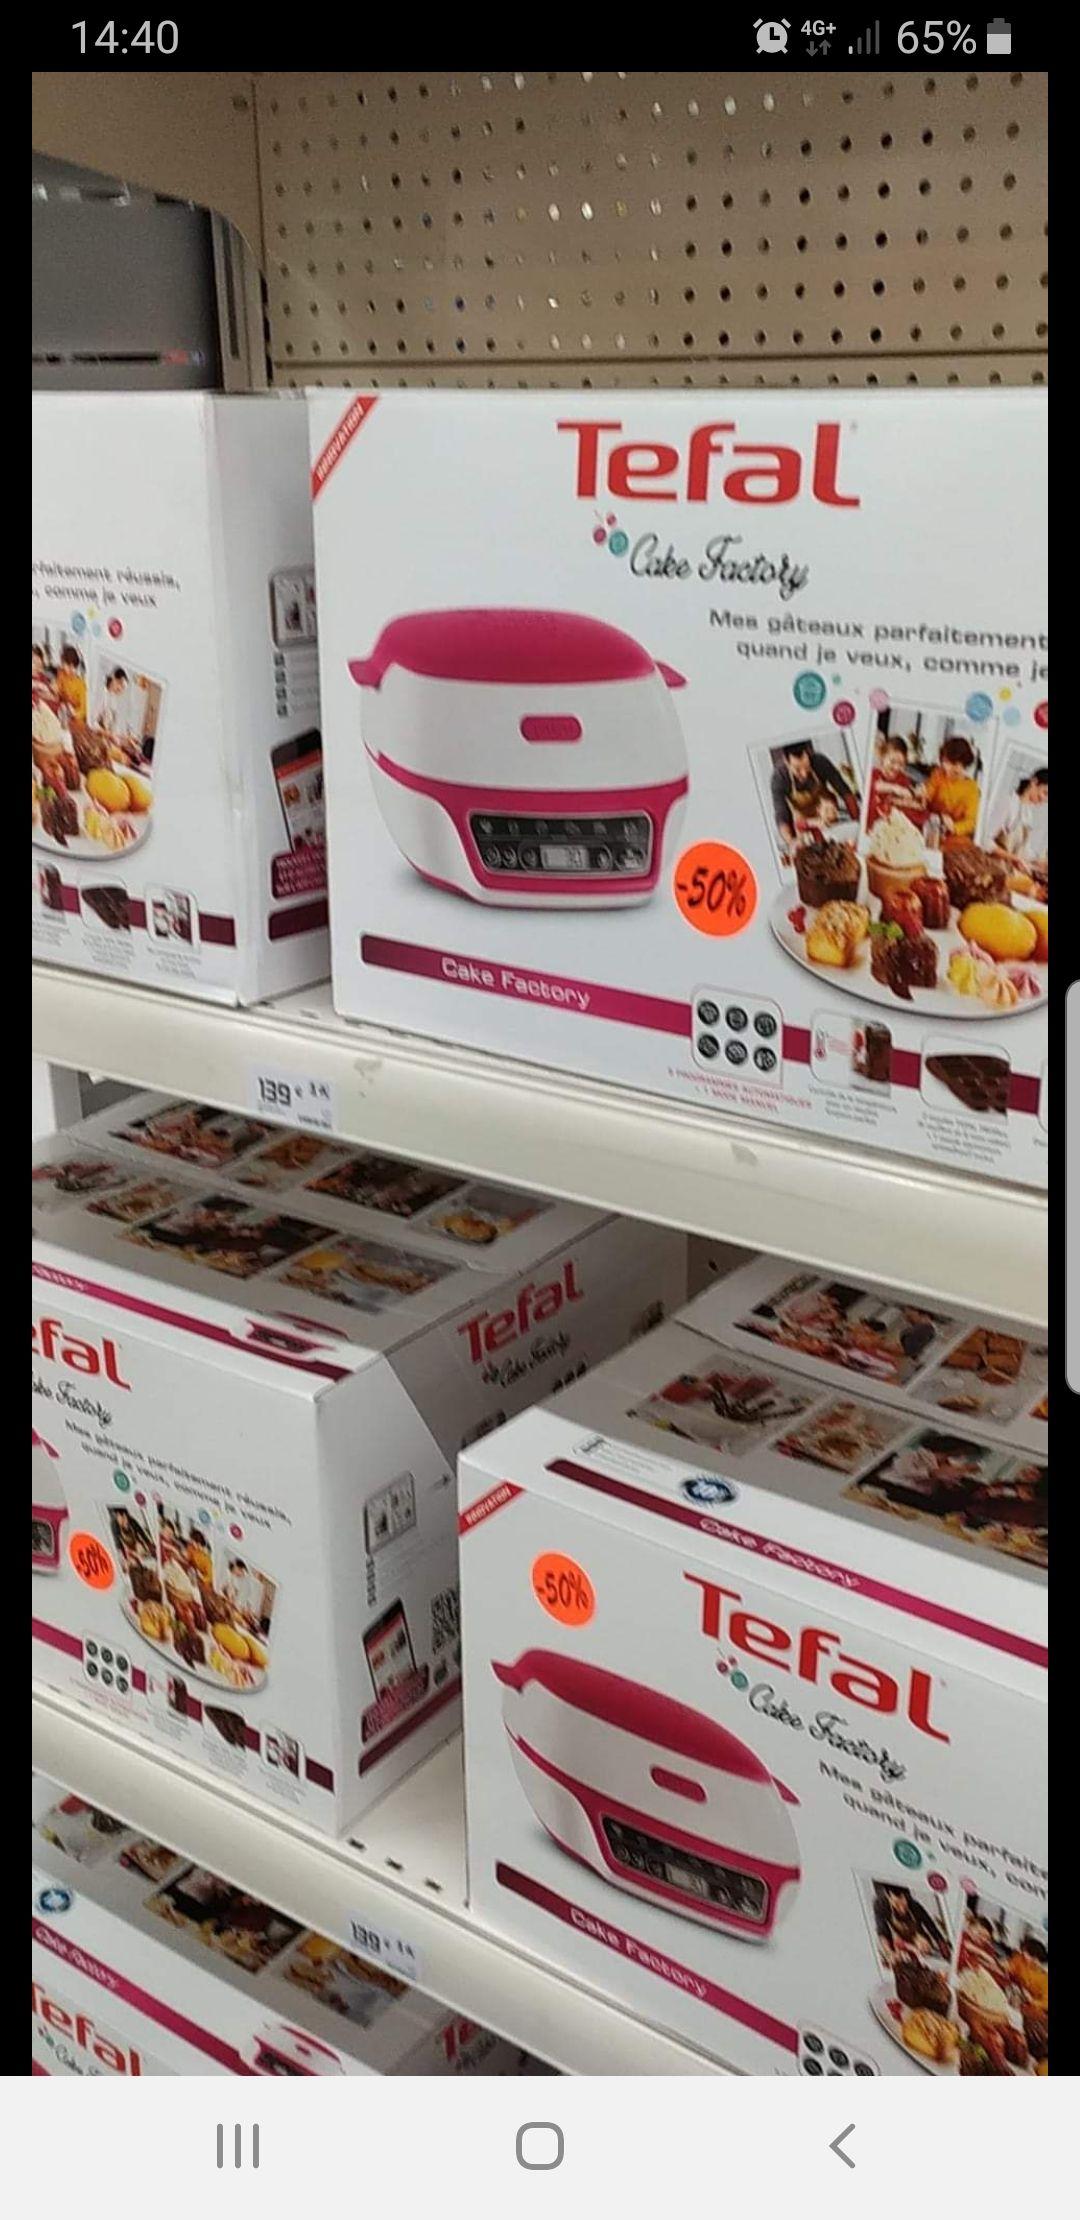 Machine à gâteaux Tefal Cake Factory KD801811 (1100 W) - Albi (81)